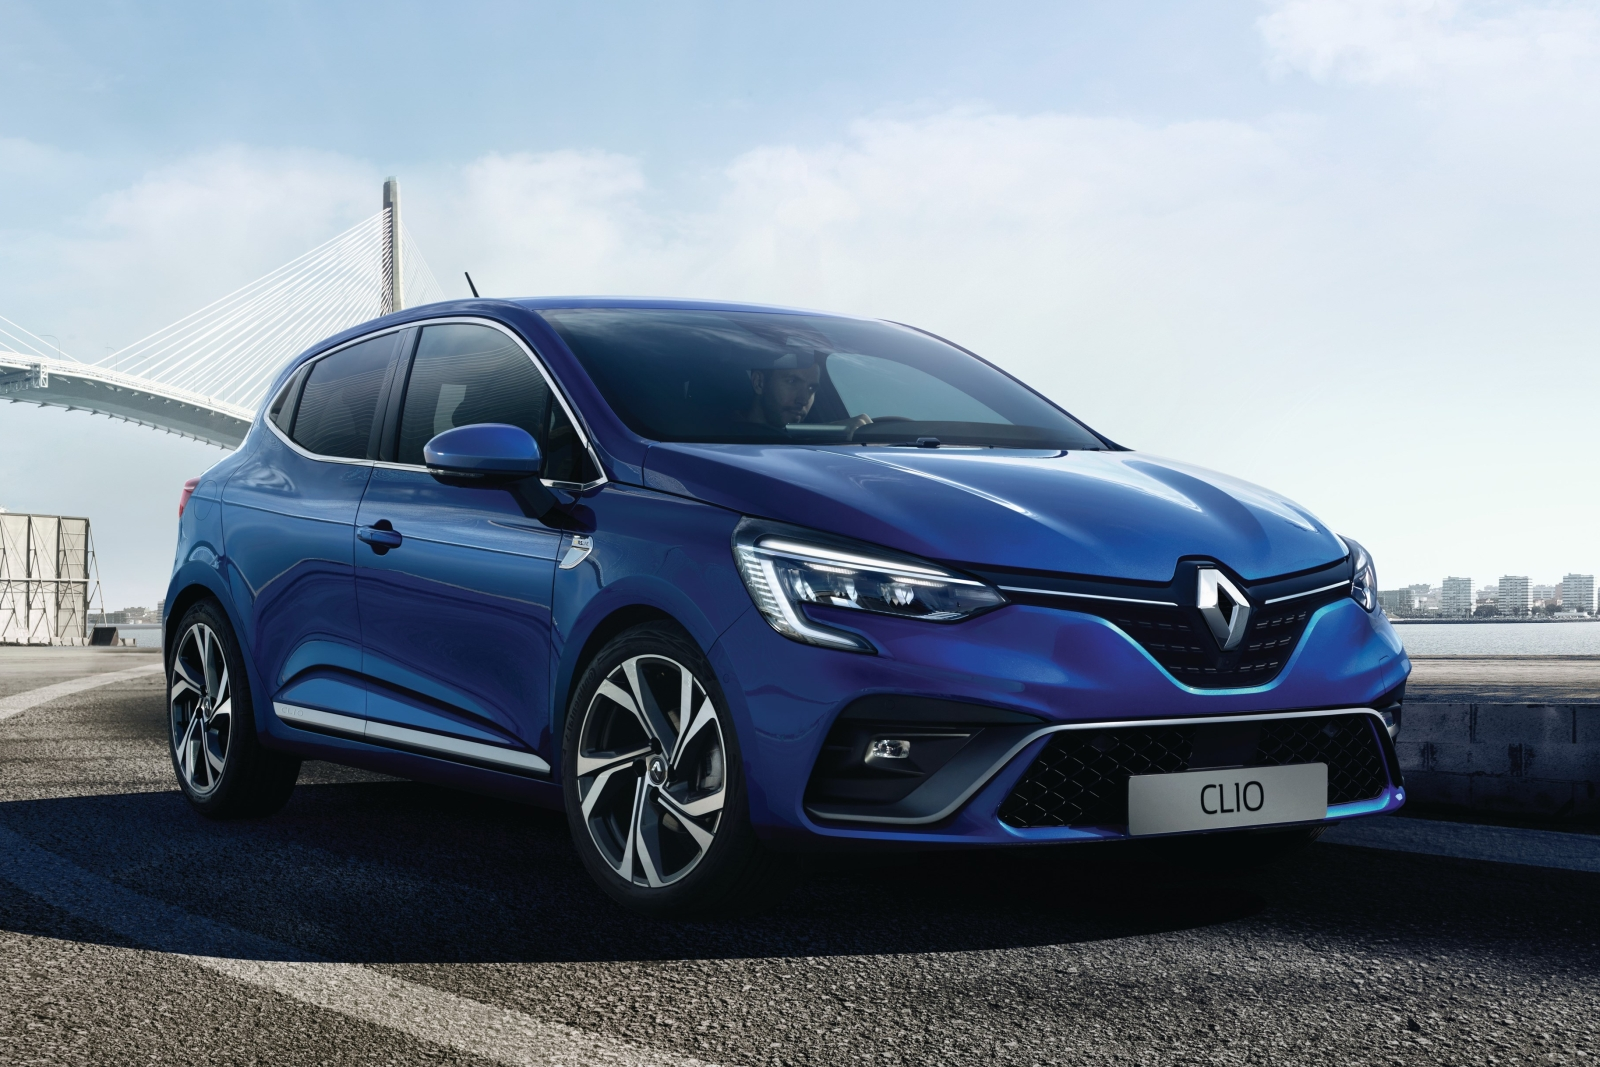 Új Renault Clio